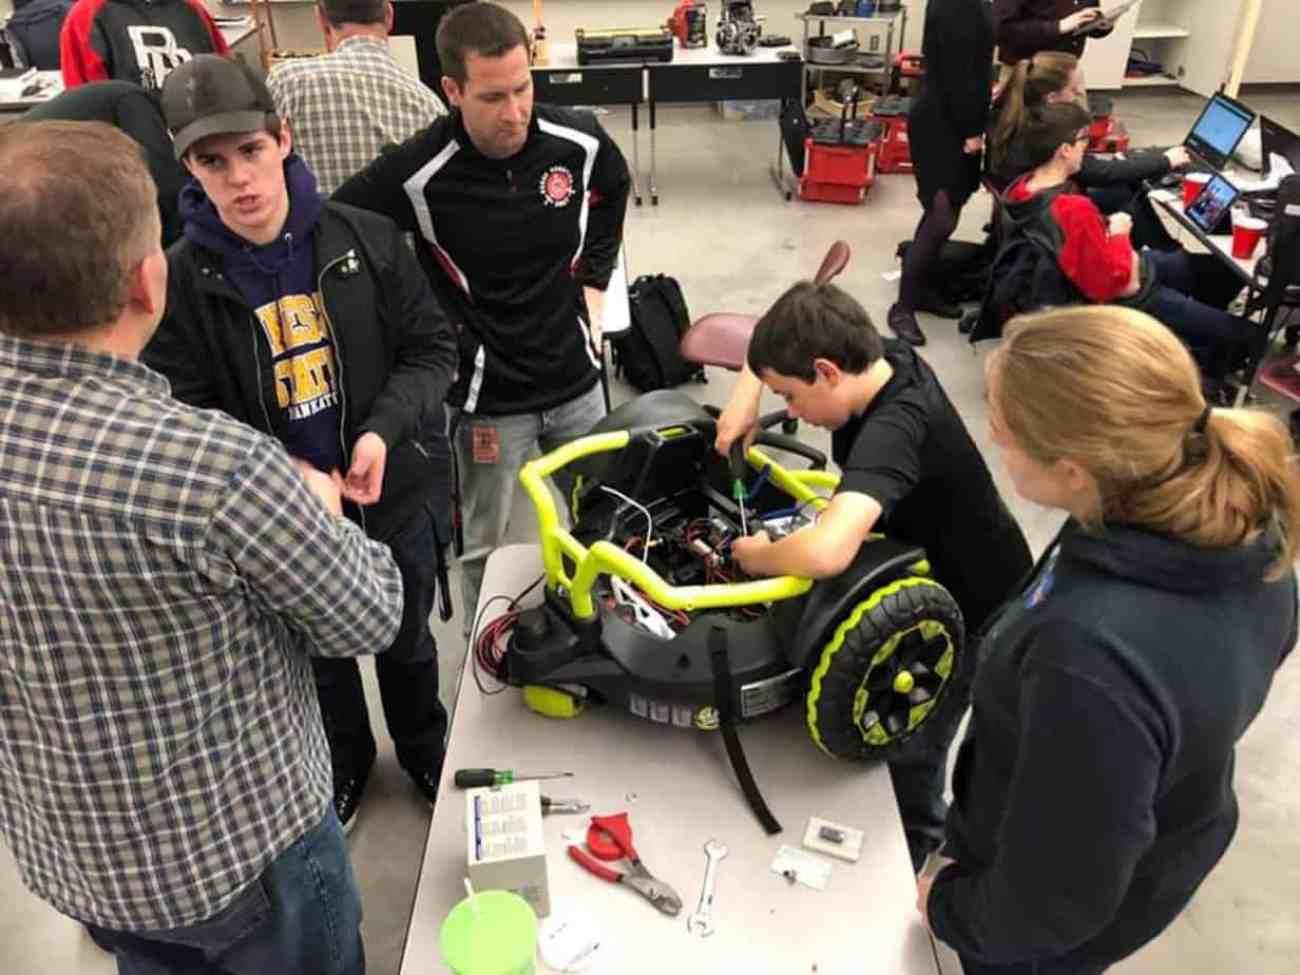 Farmington High School freshman Alex Treakle, working on the car, said he was glad he could help